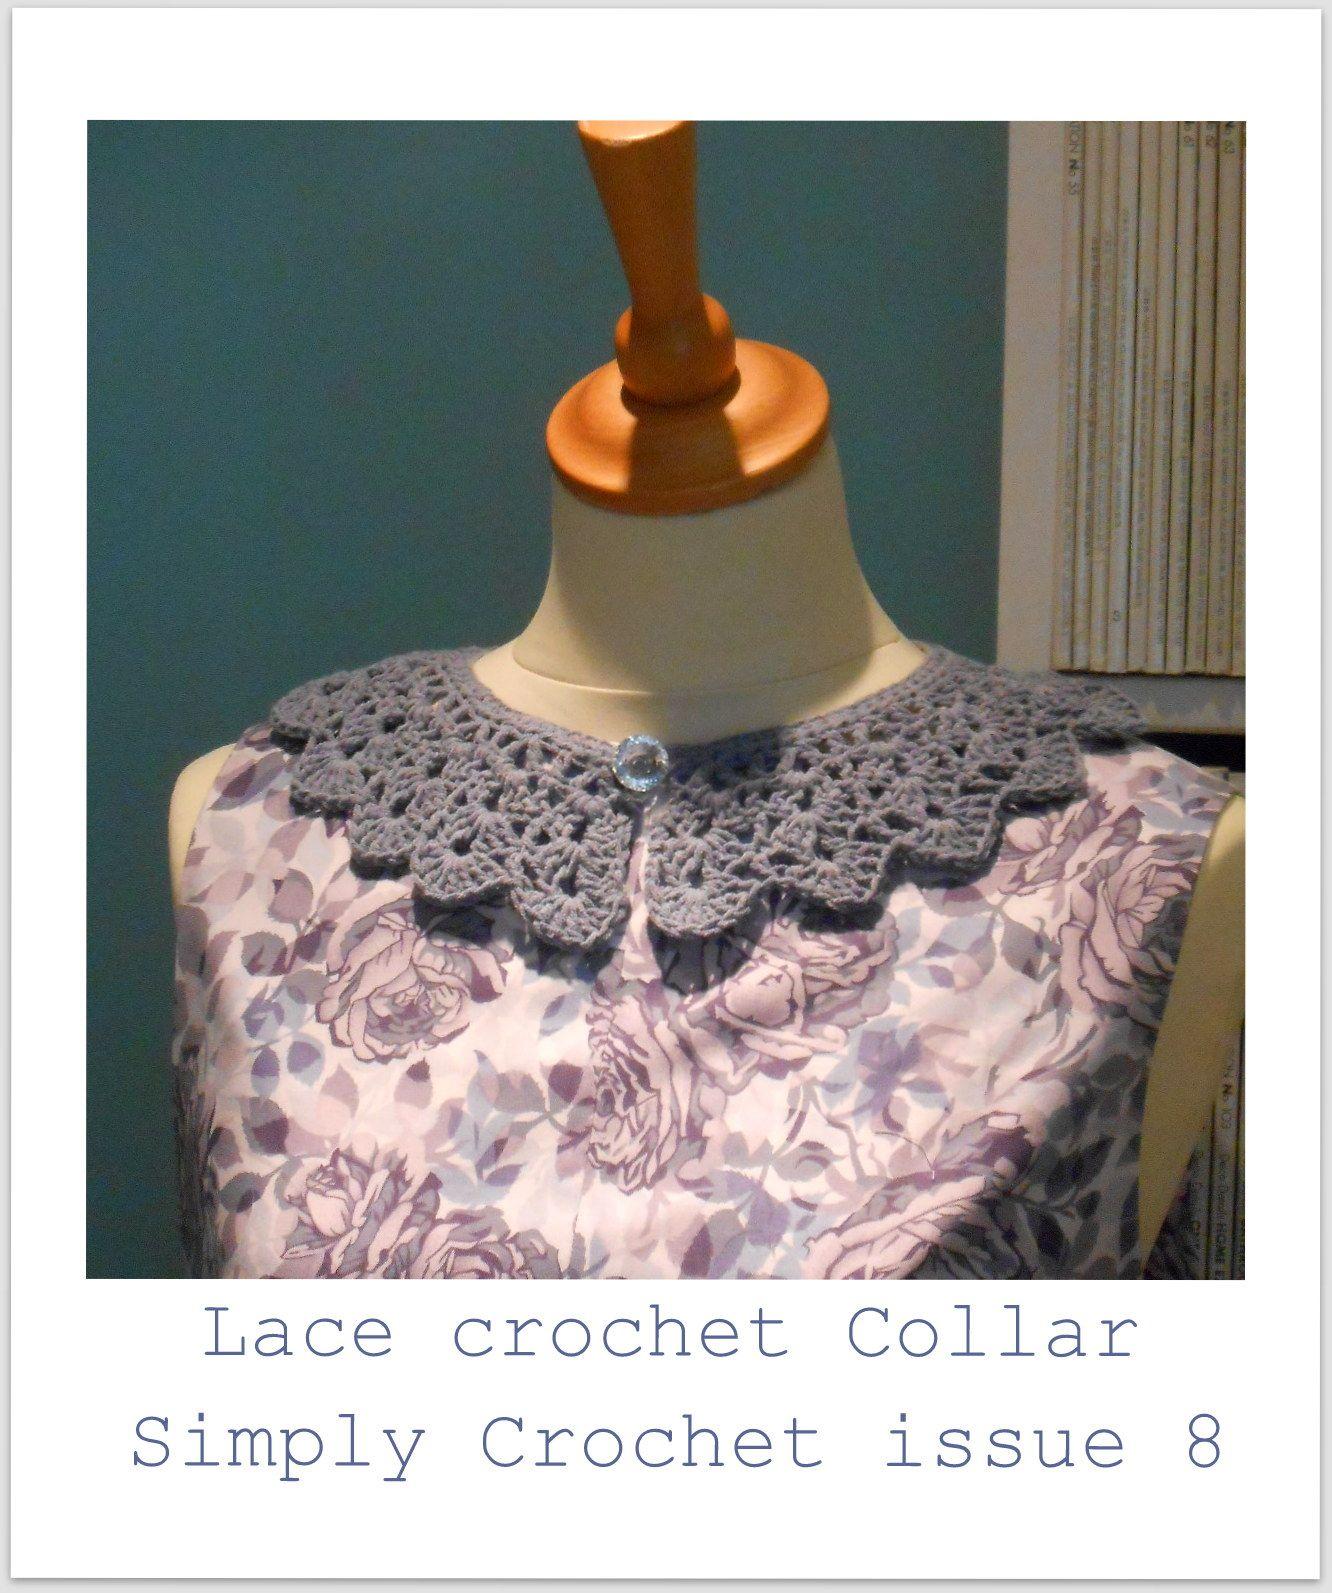 http://lazydaisyjones.blogspot.co.uk/  my new obsession crochet lace collars